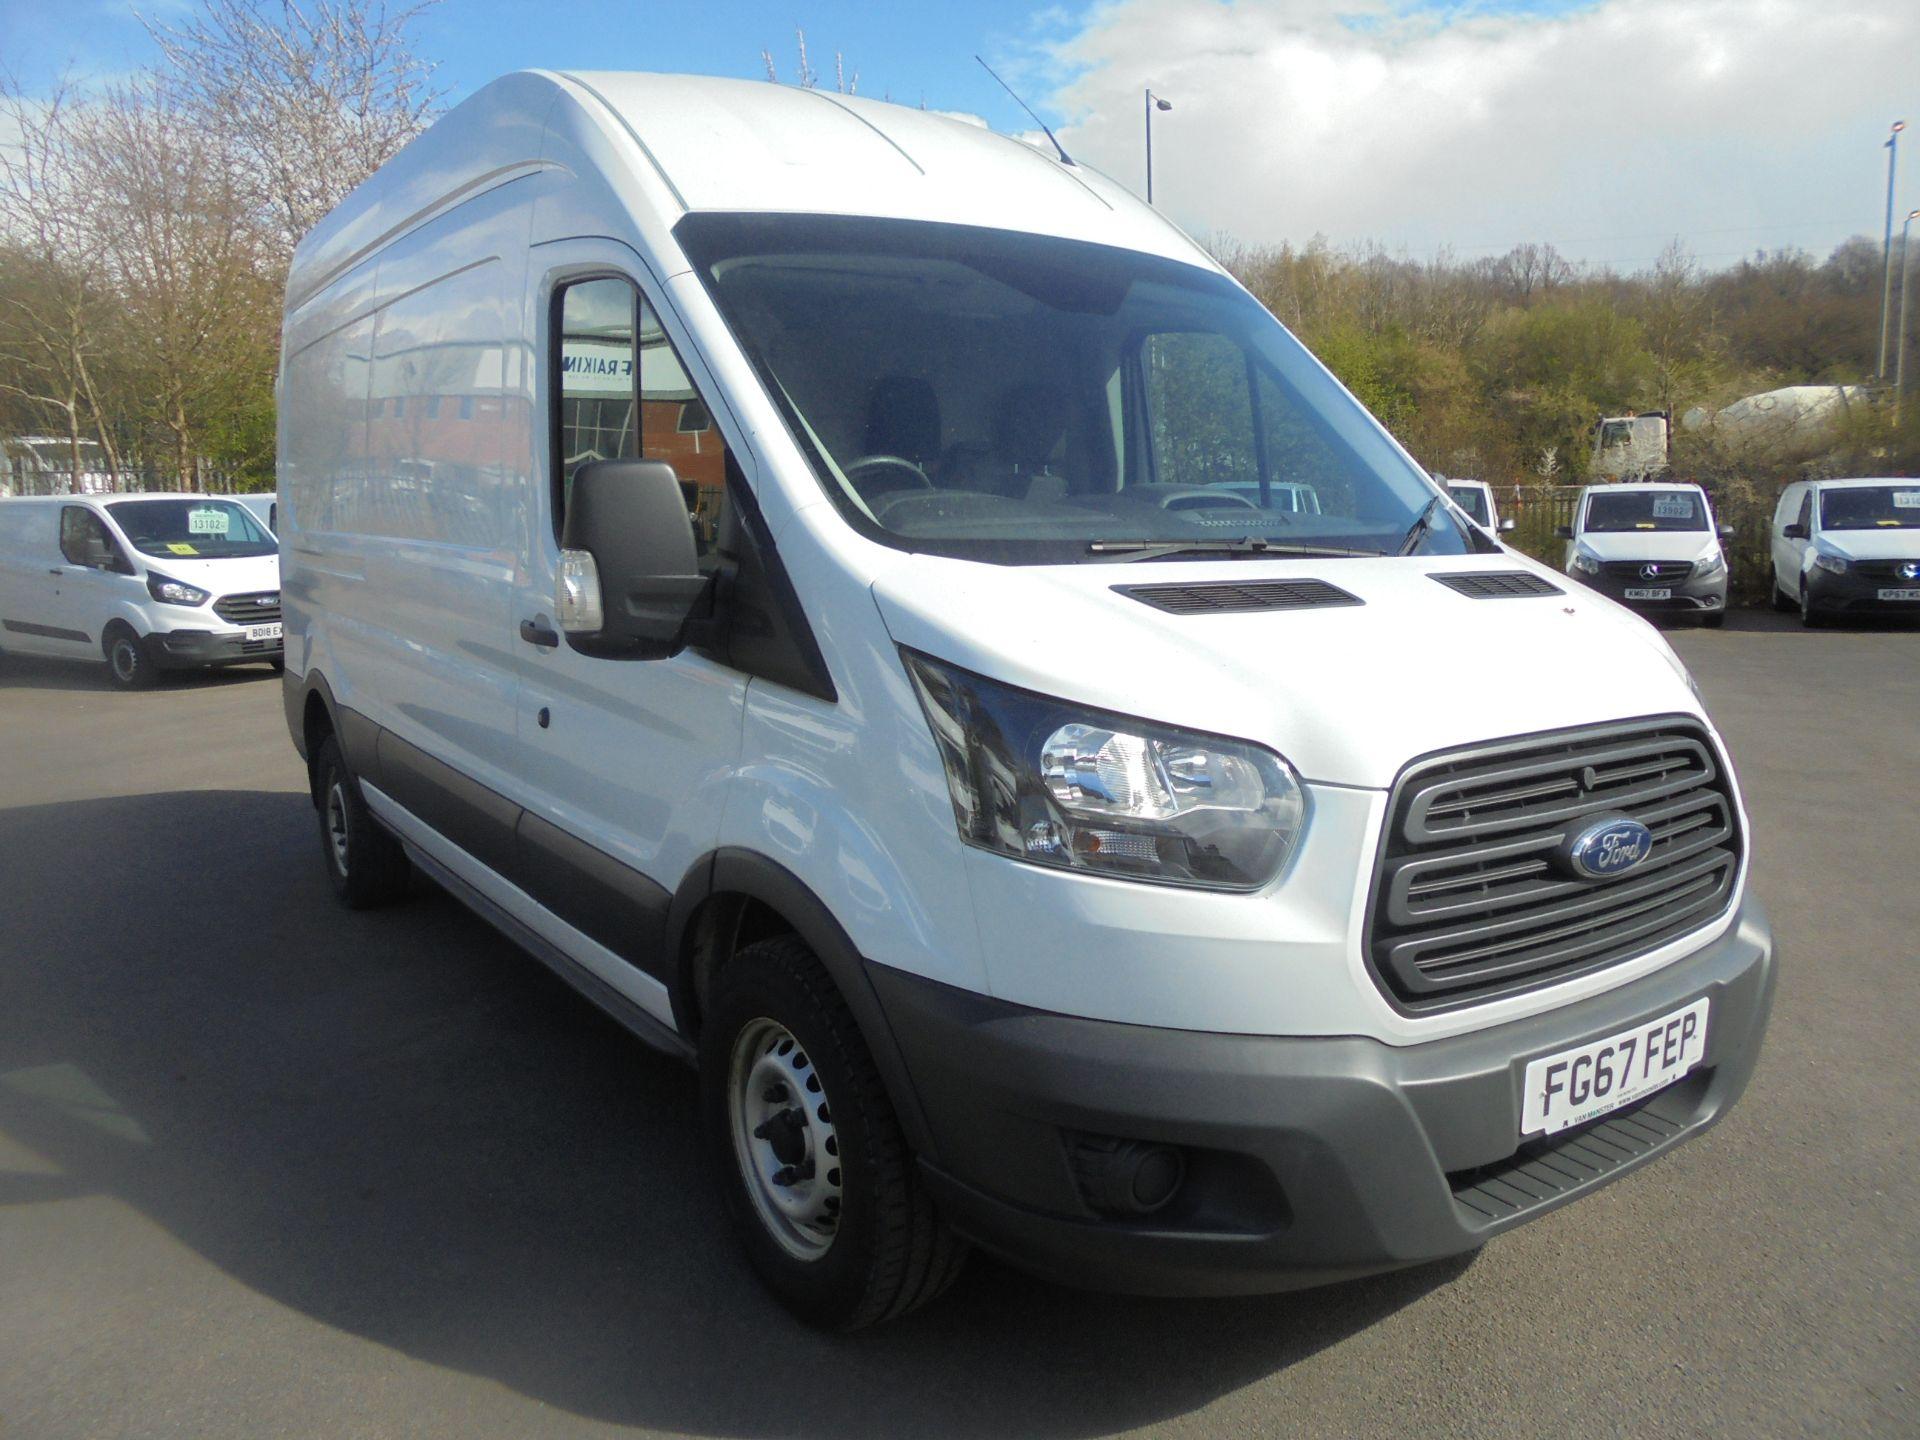 2017 Ford Transit 2.0 Tdci 130Ps H3 Van (FG67FEP) Image 1